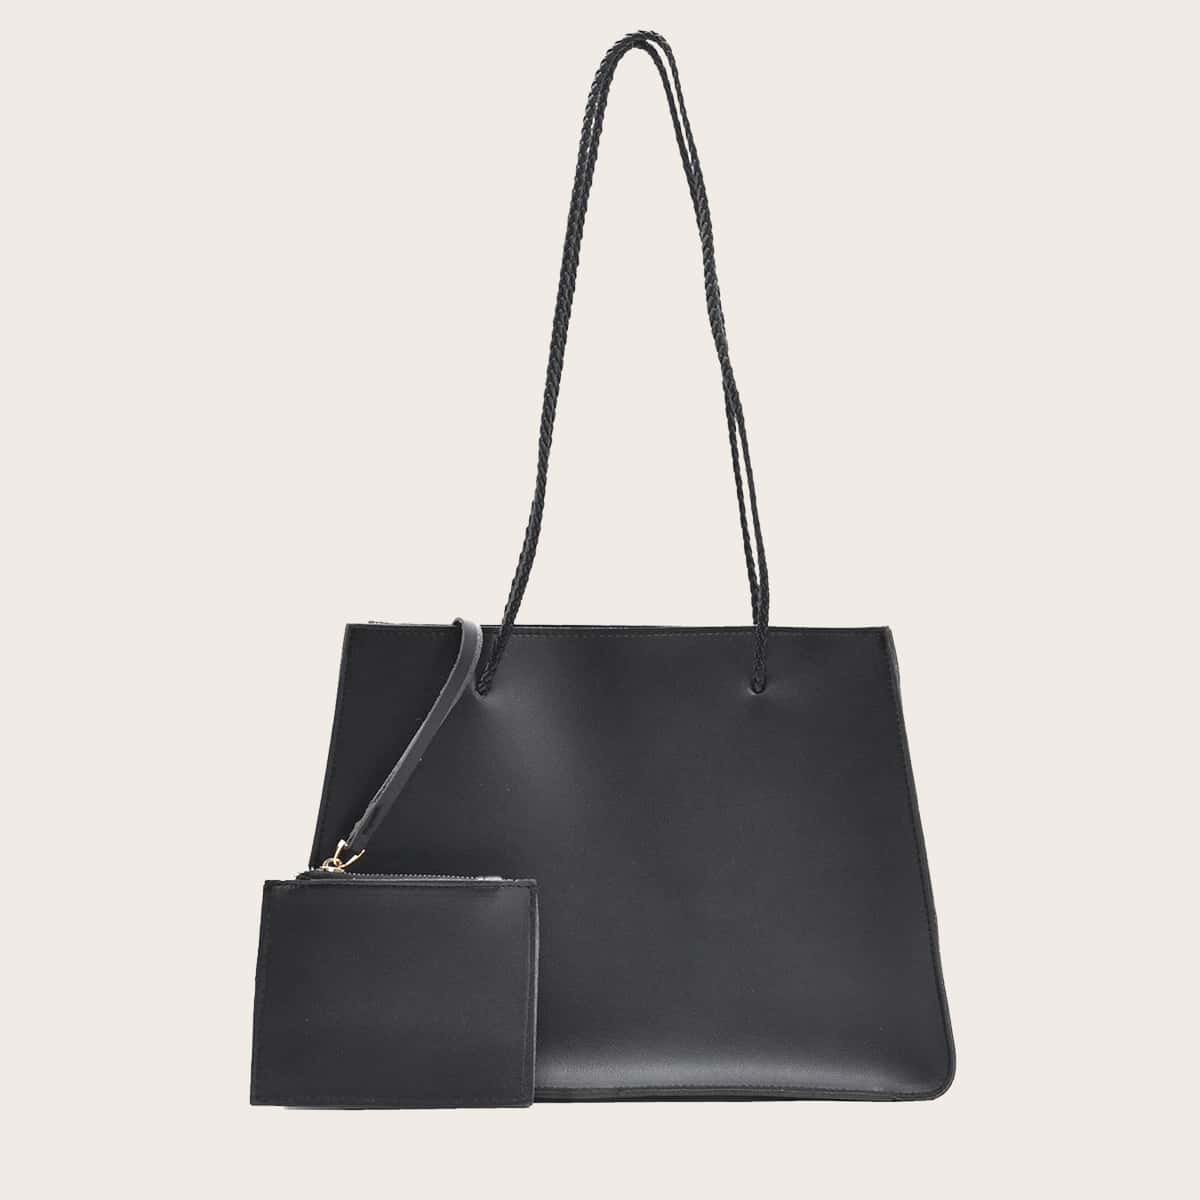 Minimalist Tote Bag With Purses (swbag18200915189) photo